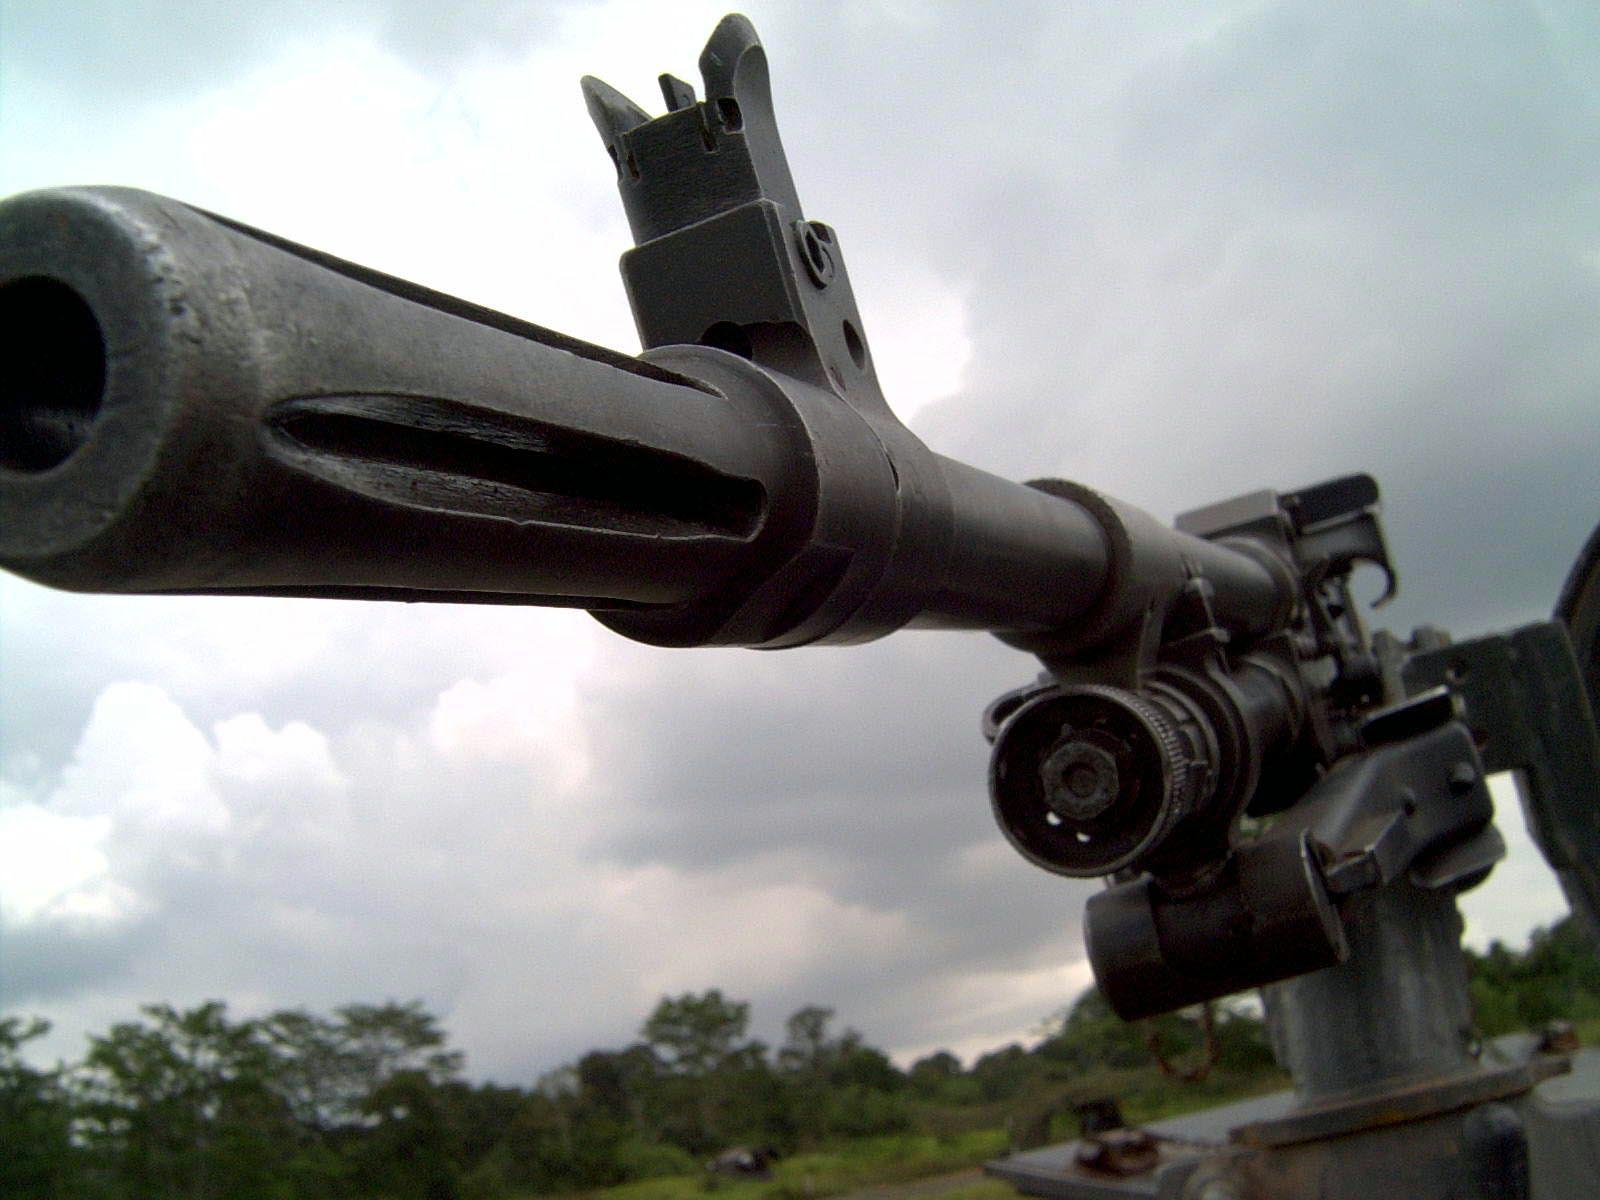 The M60 machine gun by garvin 1600x1200